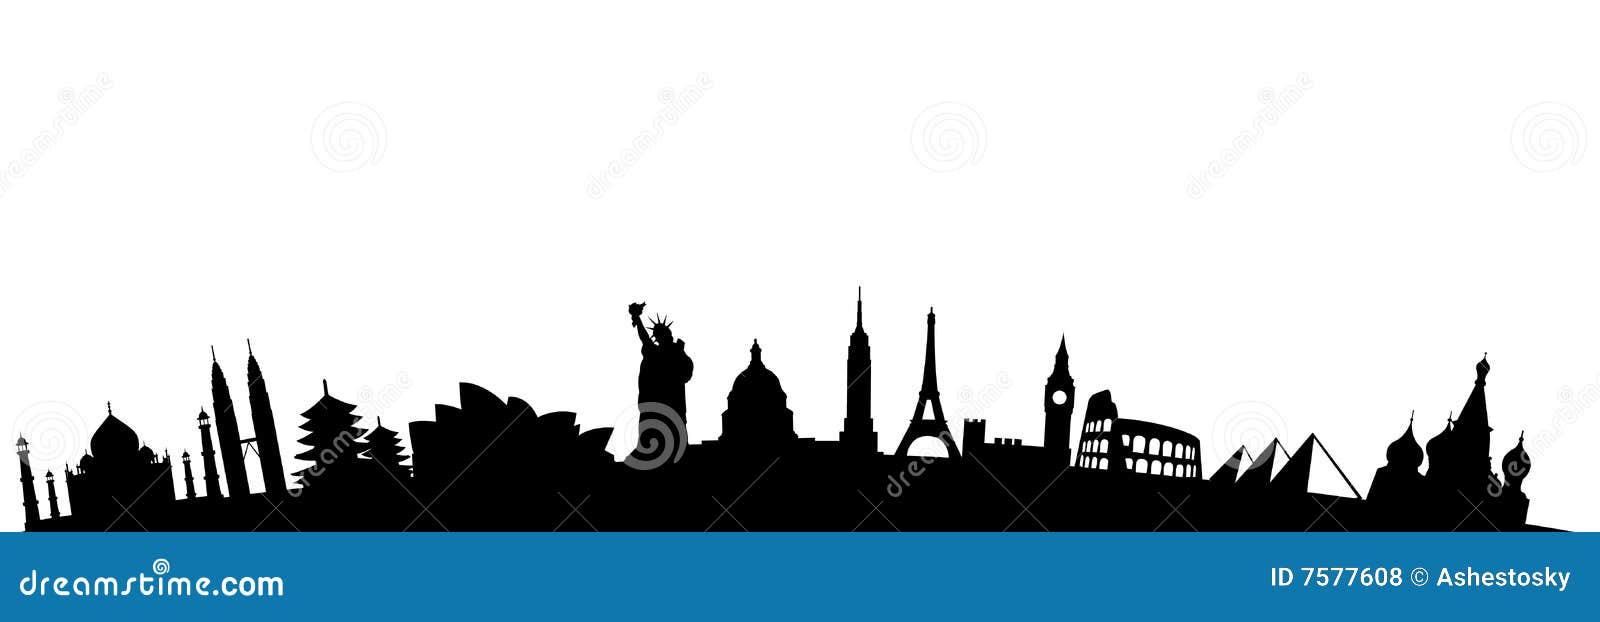 Travel destinations landmarks